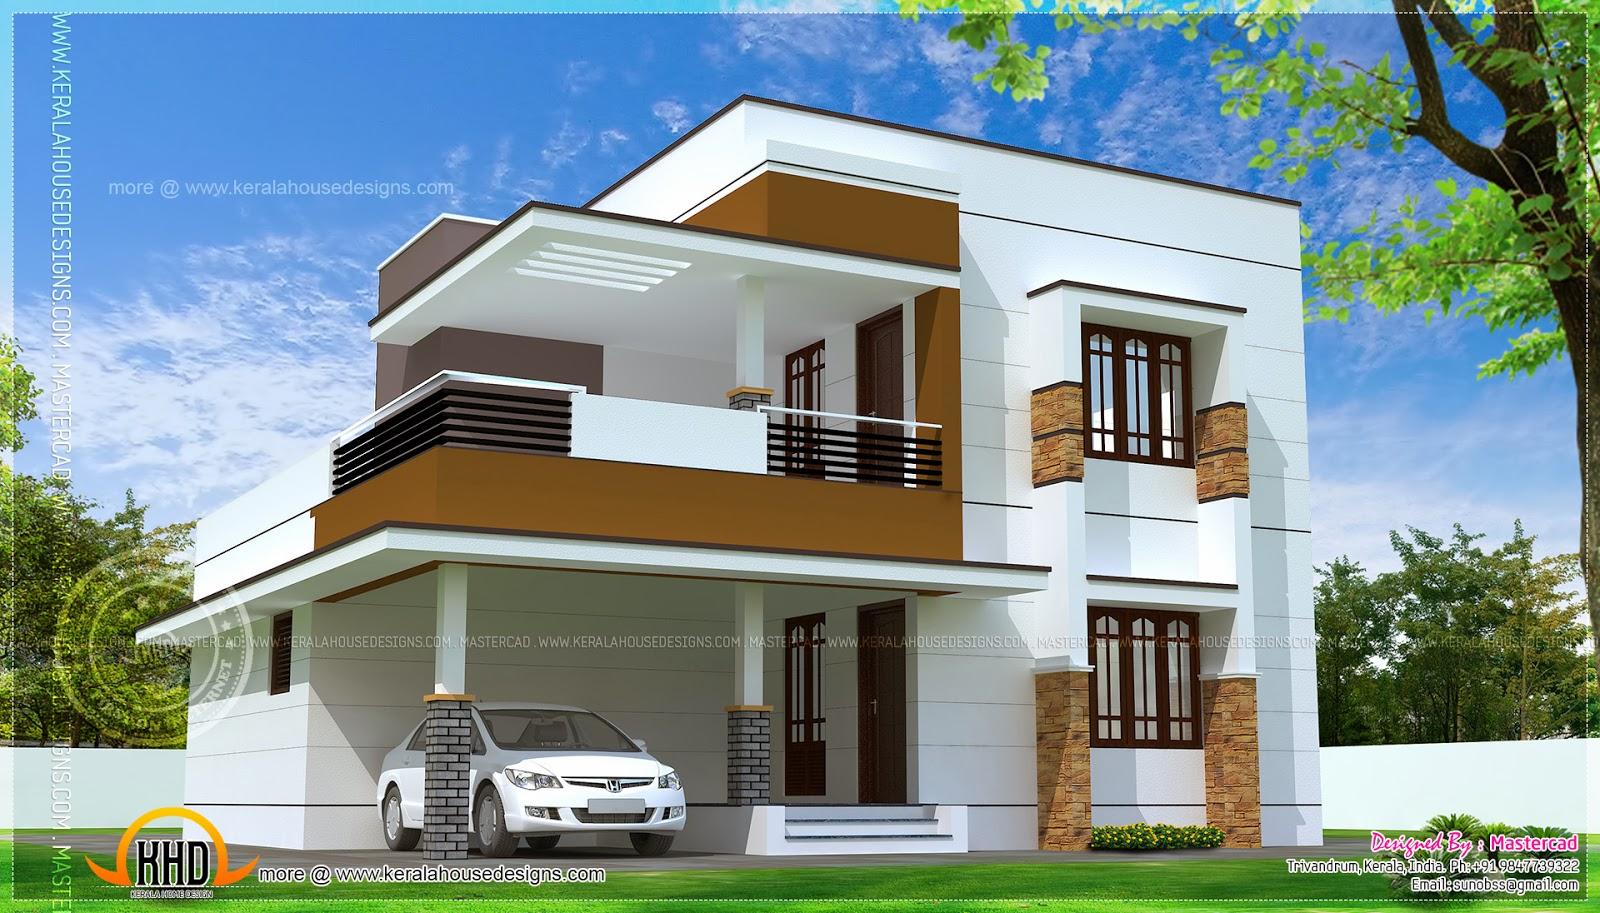 home design square feet kerala home design floor plans modern house plans designs ideas ark